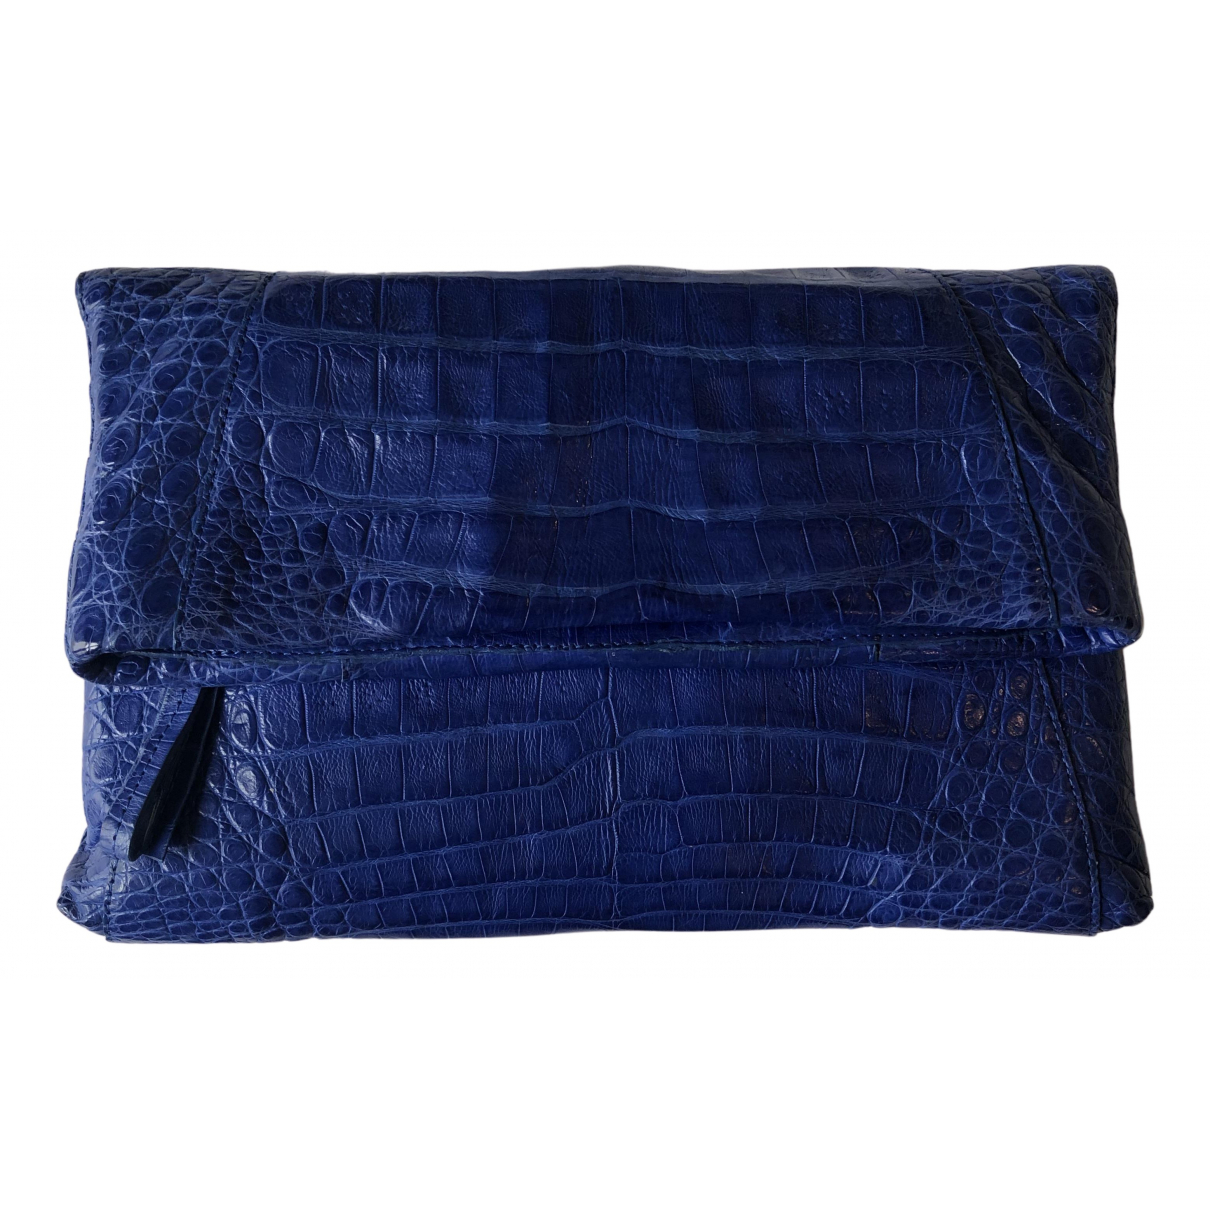 Nancy Gonzalez N Blue Crocodile Clutch bag for Women N